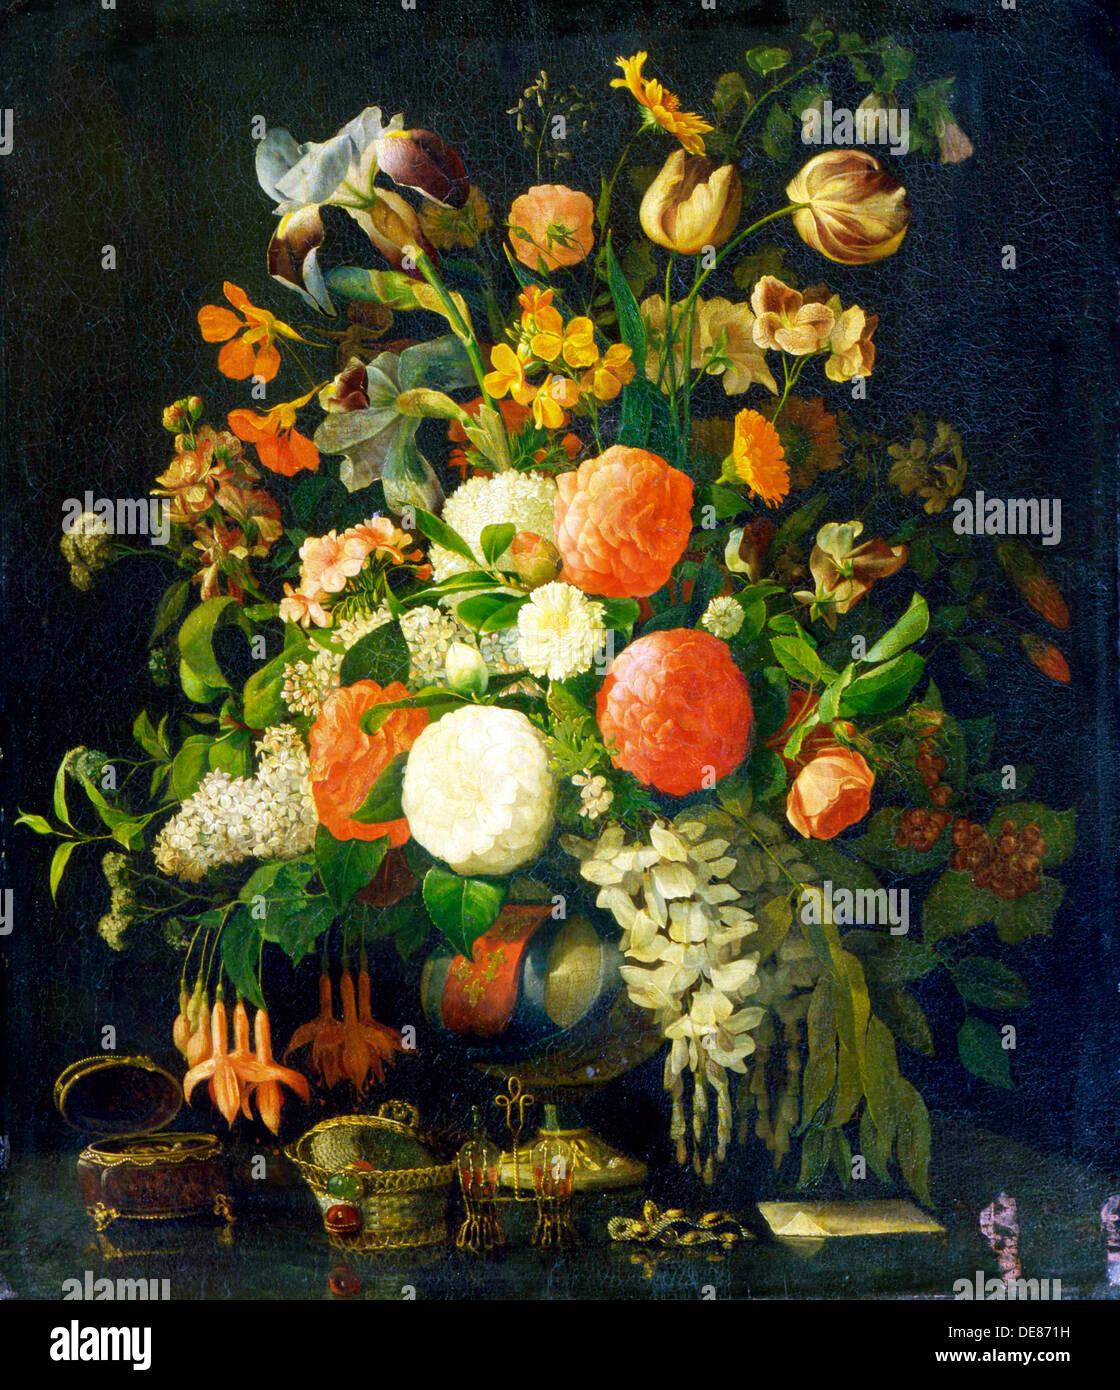 'Flowers', 18th century. Artist: Rachel Ruysch - Stock Image